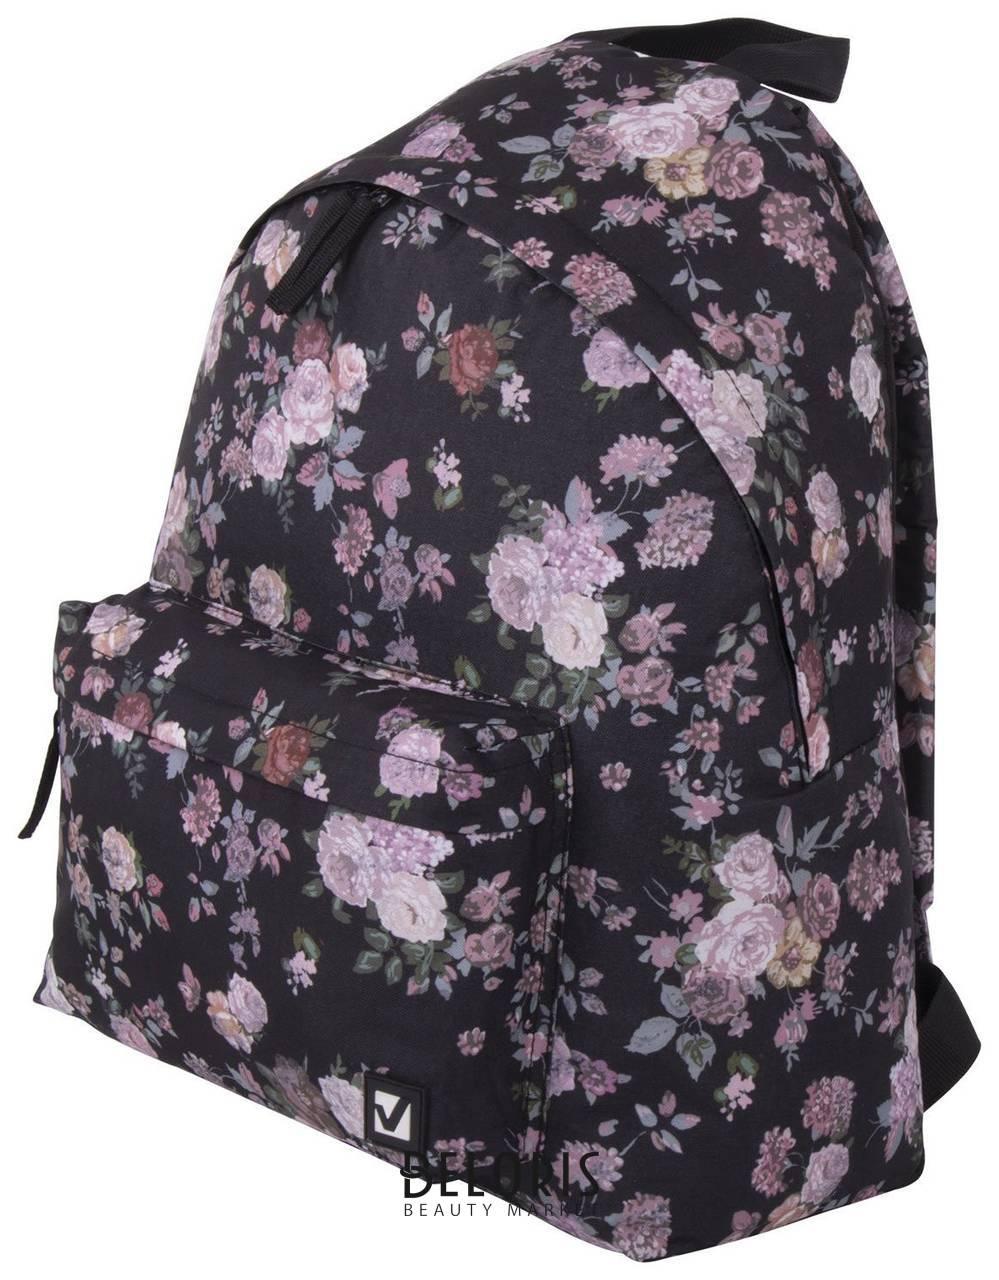 Рюкзак BRAUBERG, универсальный, сити-формат, Розы, 20 литров, 41х32х14 см Brauberg